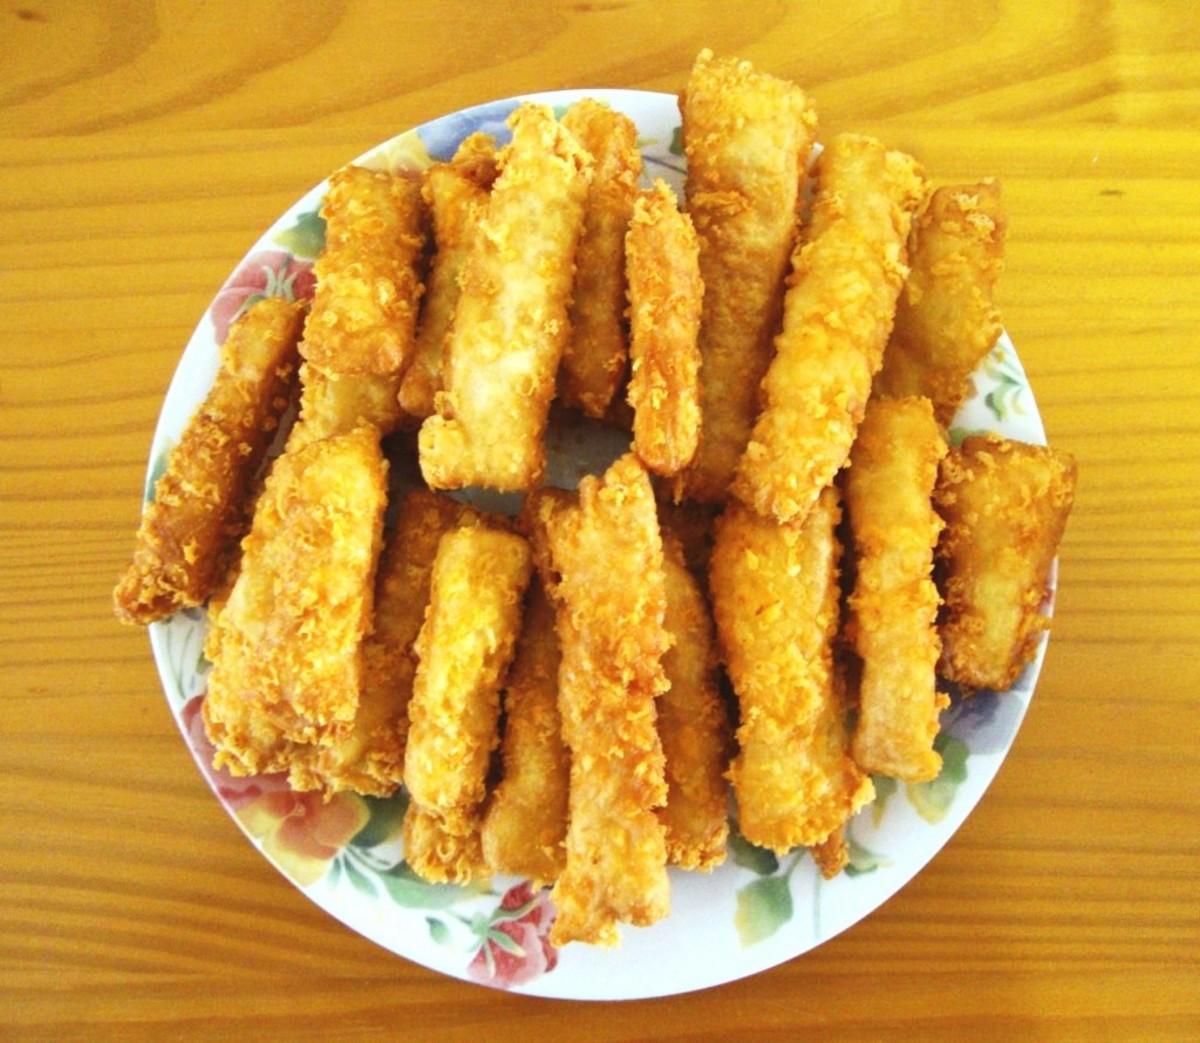 Golden fry bread fingers.